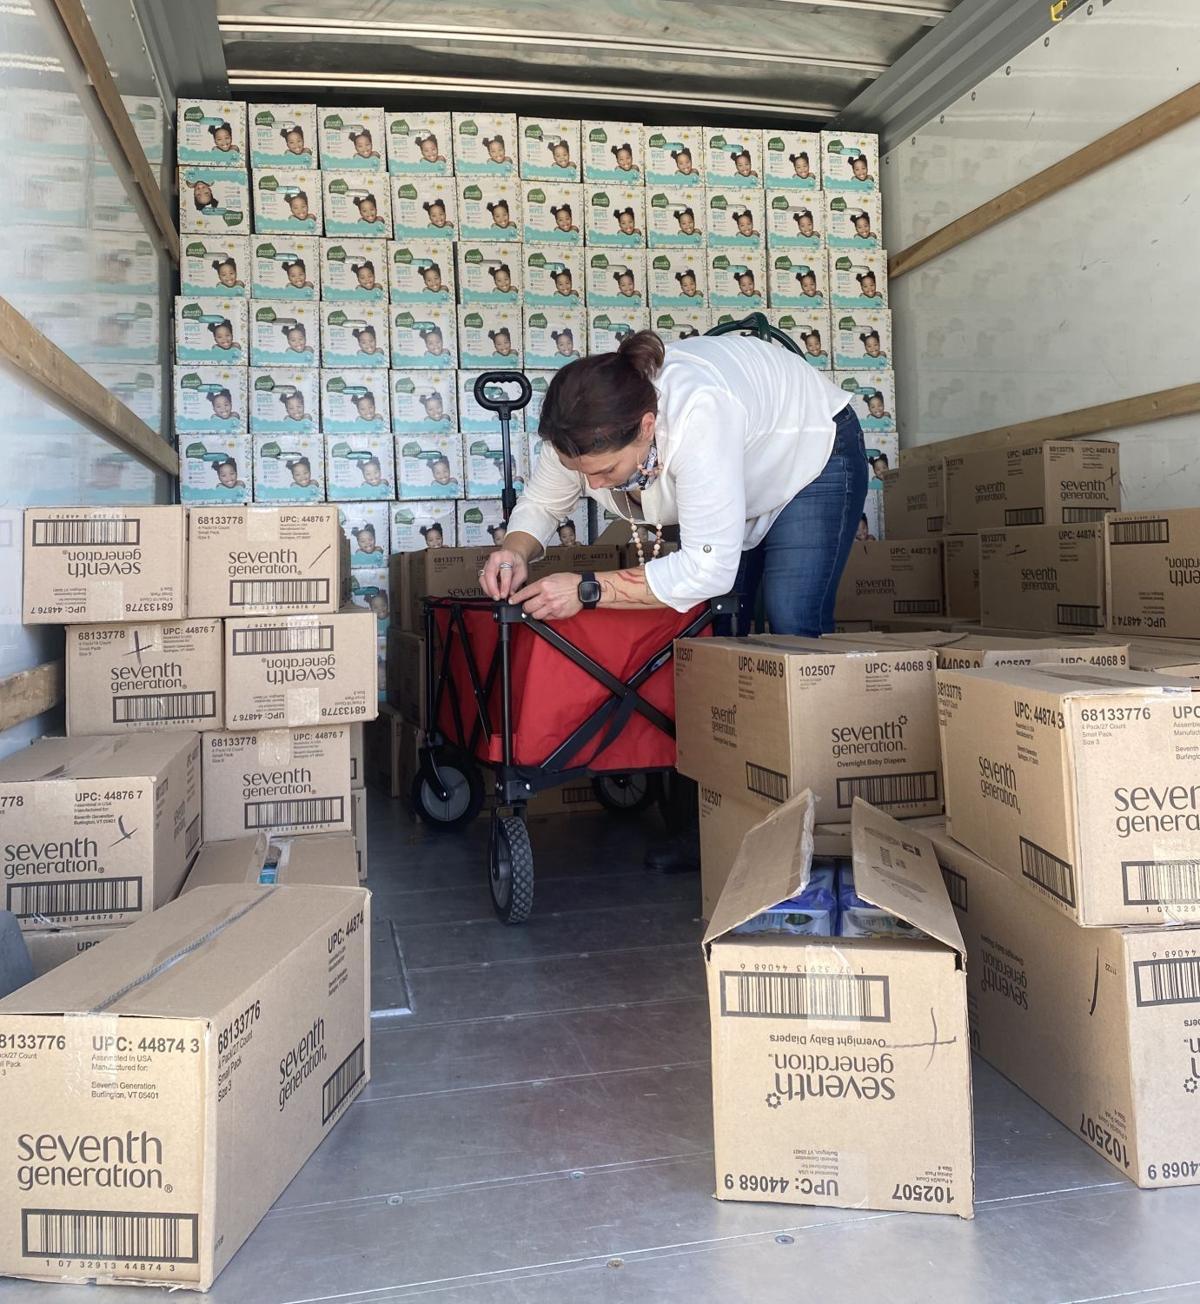 Unloading diapers